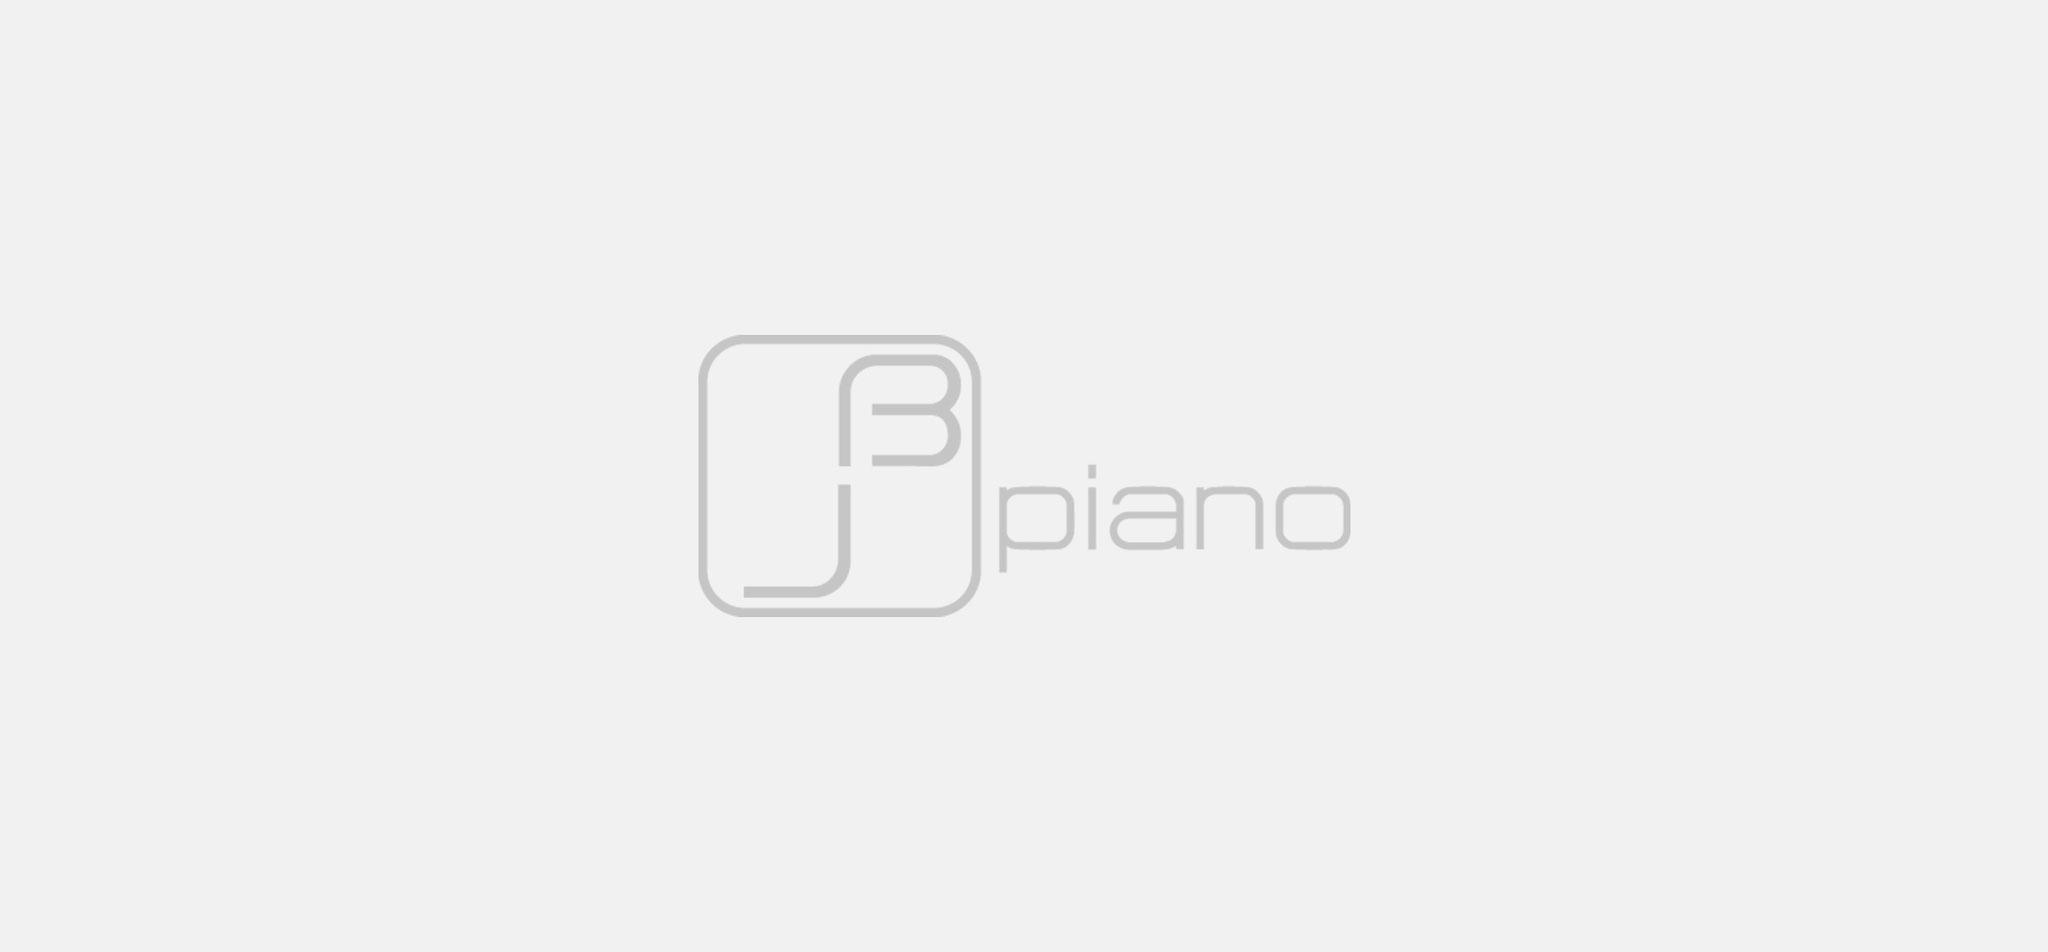 JAN BEHRENS | logo JB piano, grauversion – infragrau, gute gestaltung